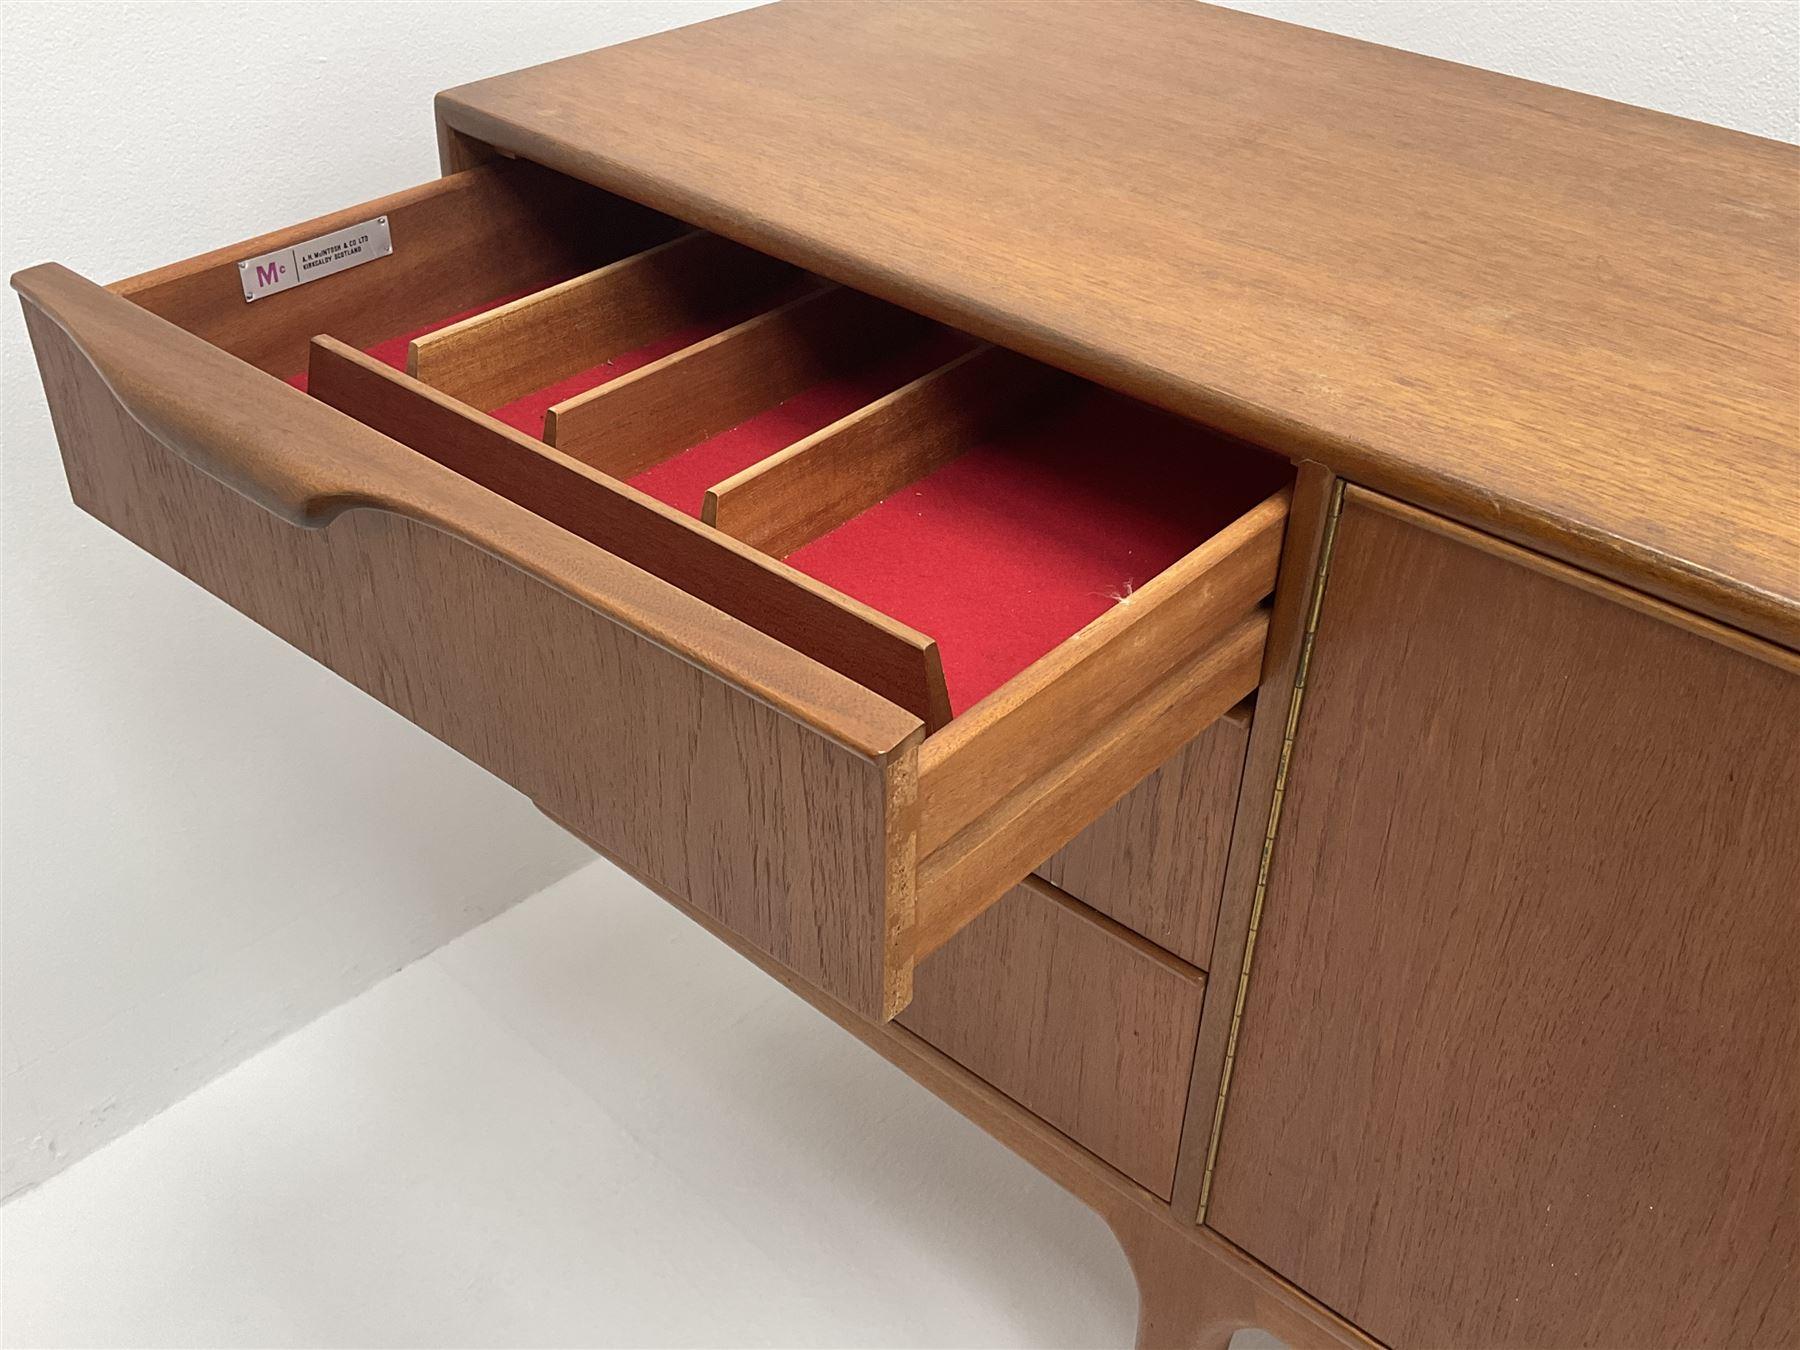 Mid 20th century A.H.McIntosh teak sideboard - Image 2 of 7